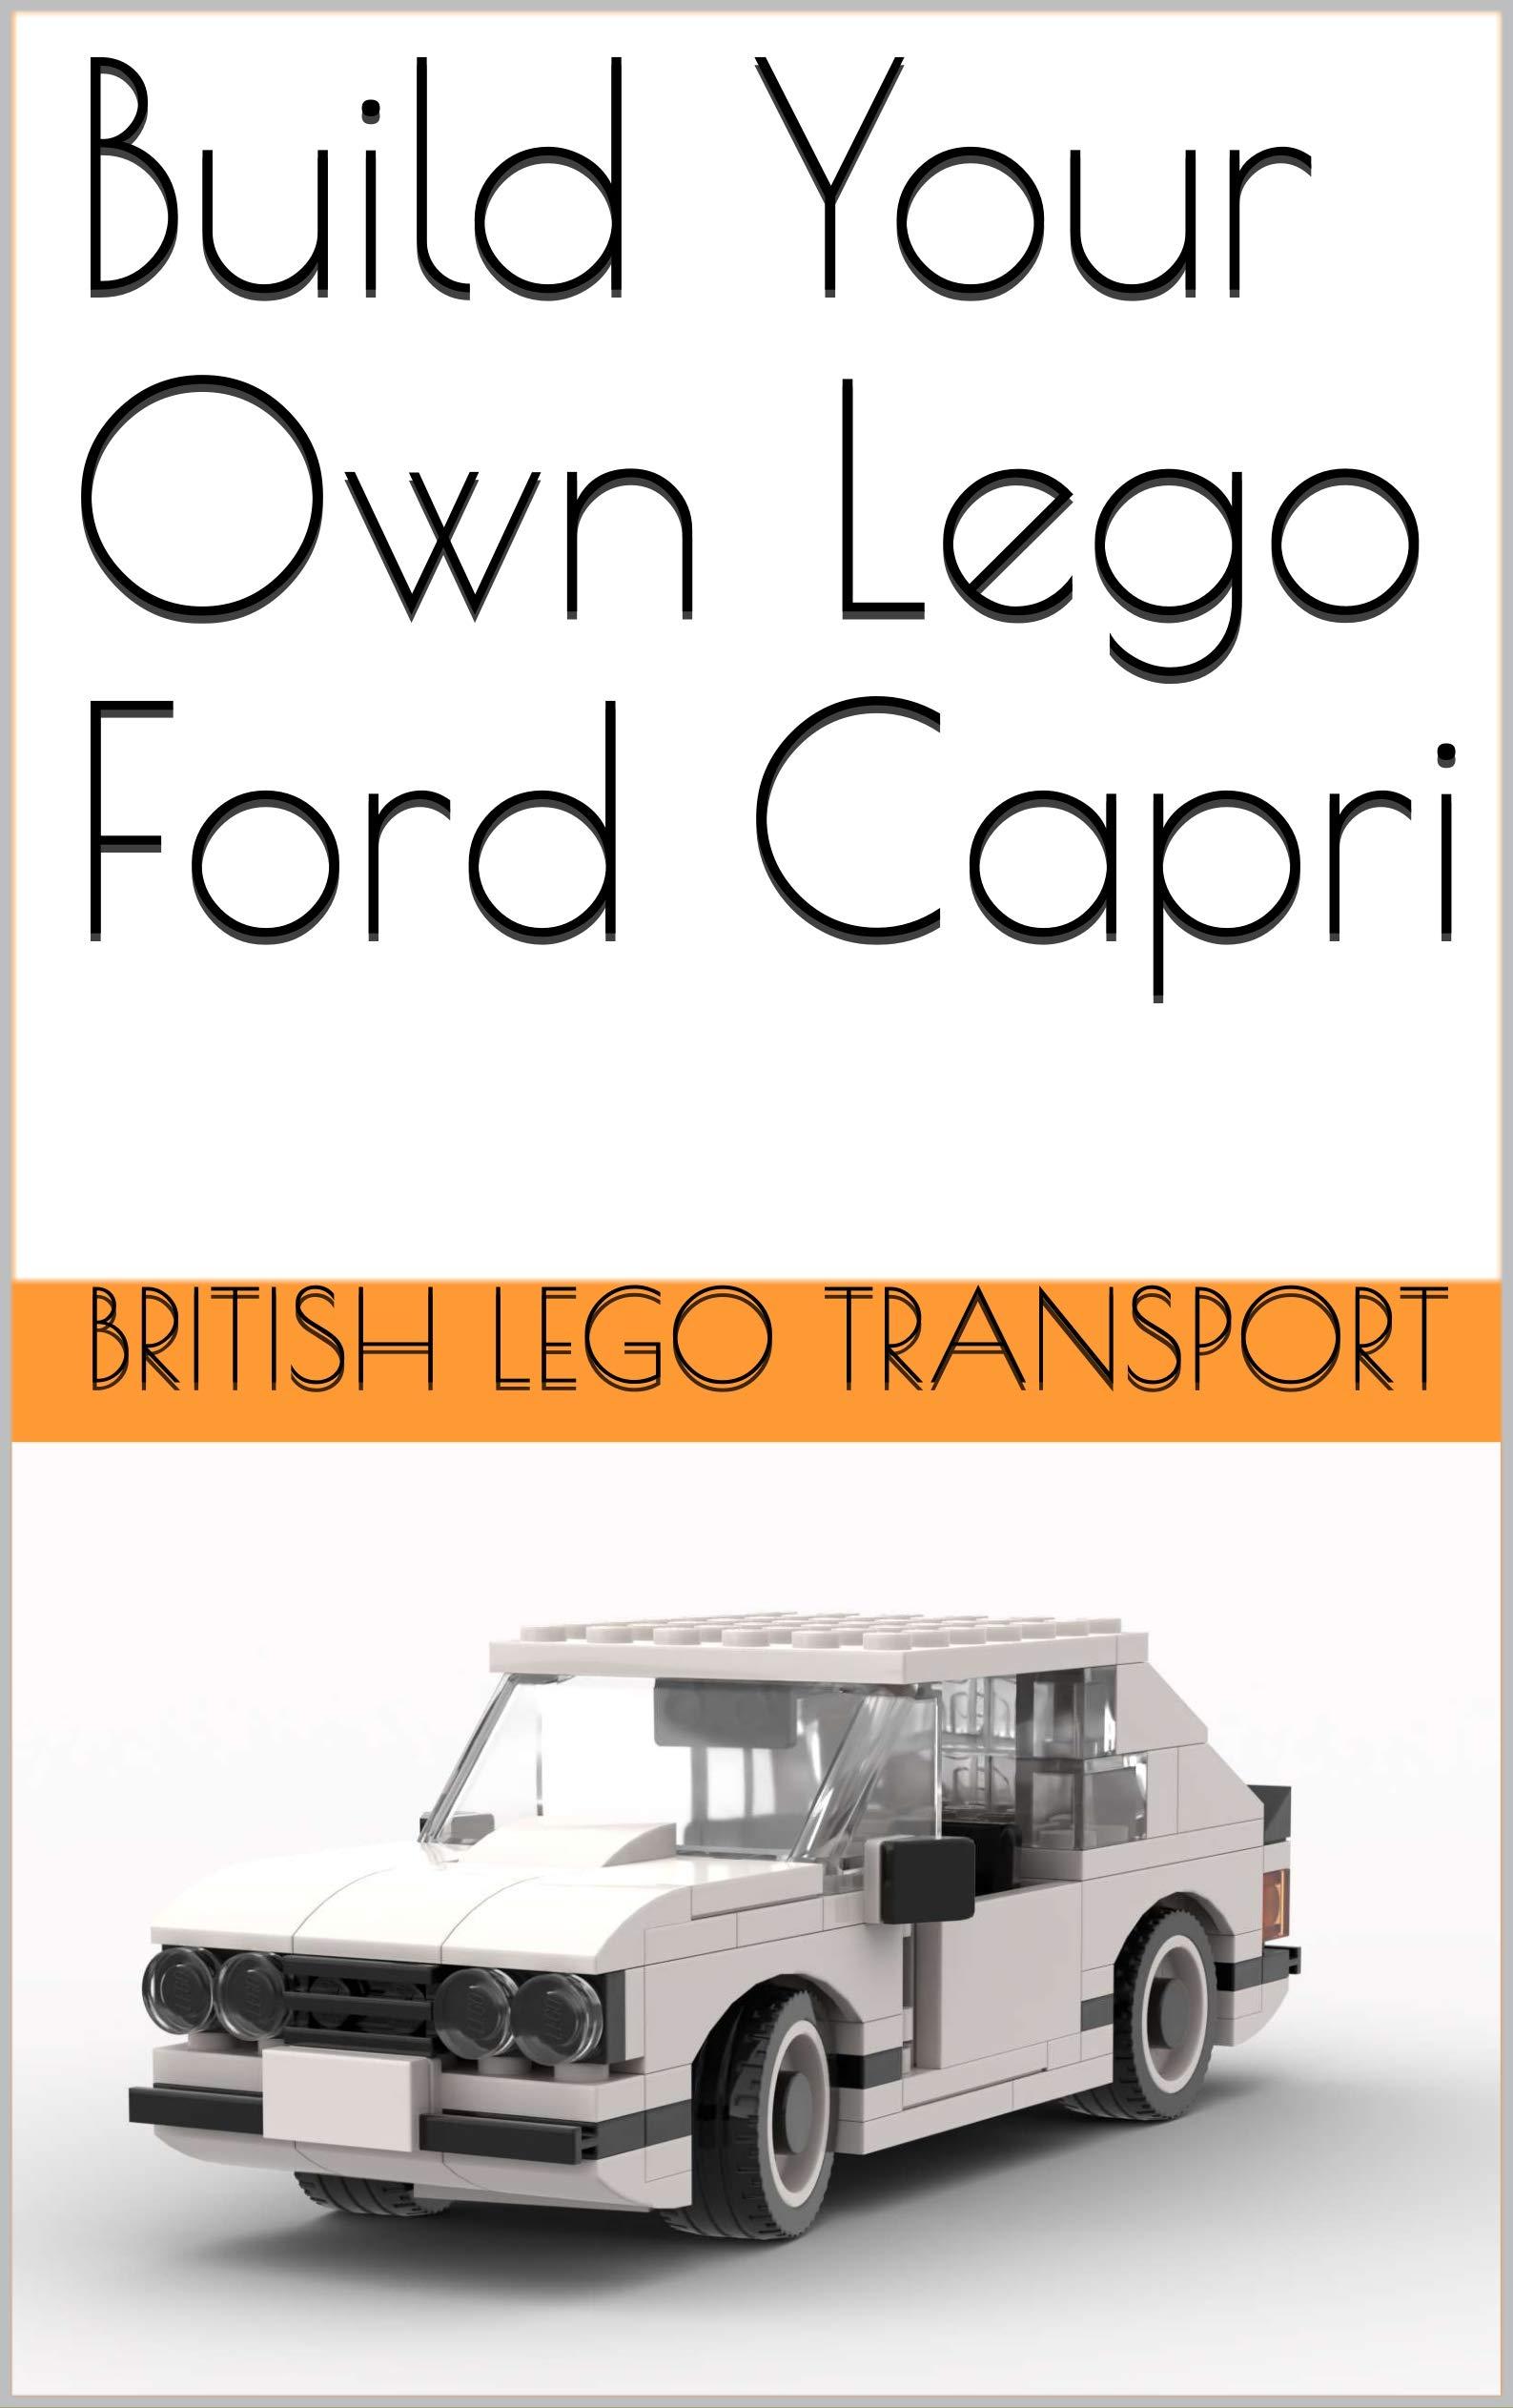 Build Your Own Lego Ford Capri (British Lego Transport Book 19)